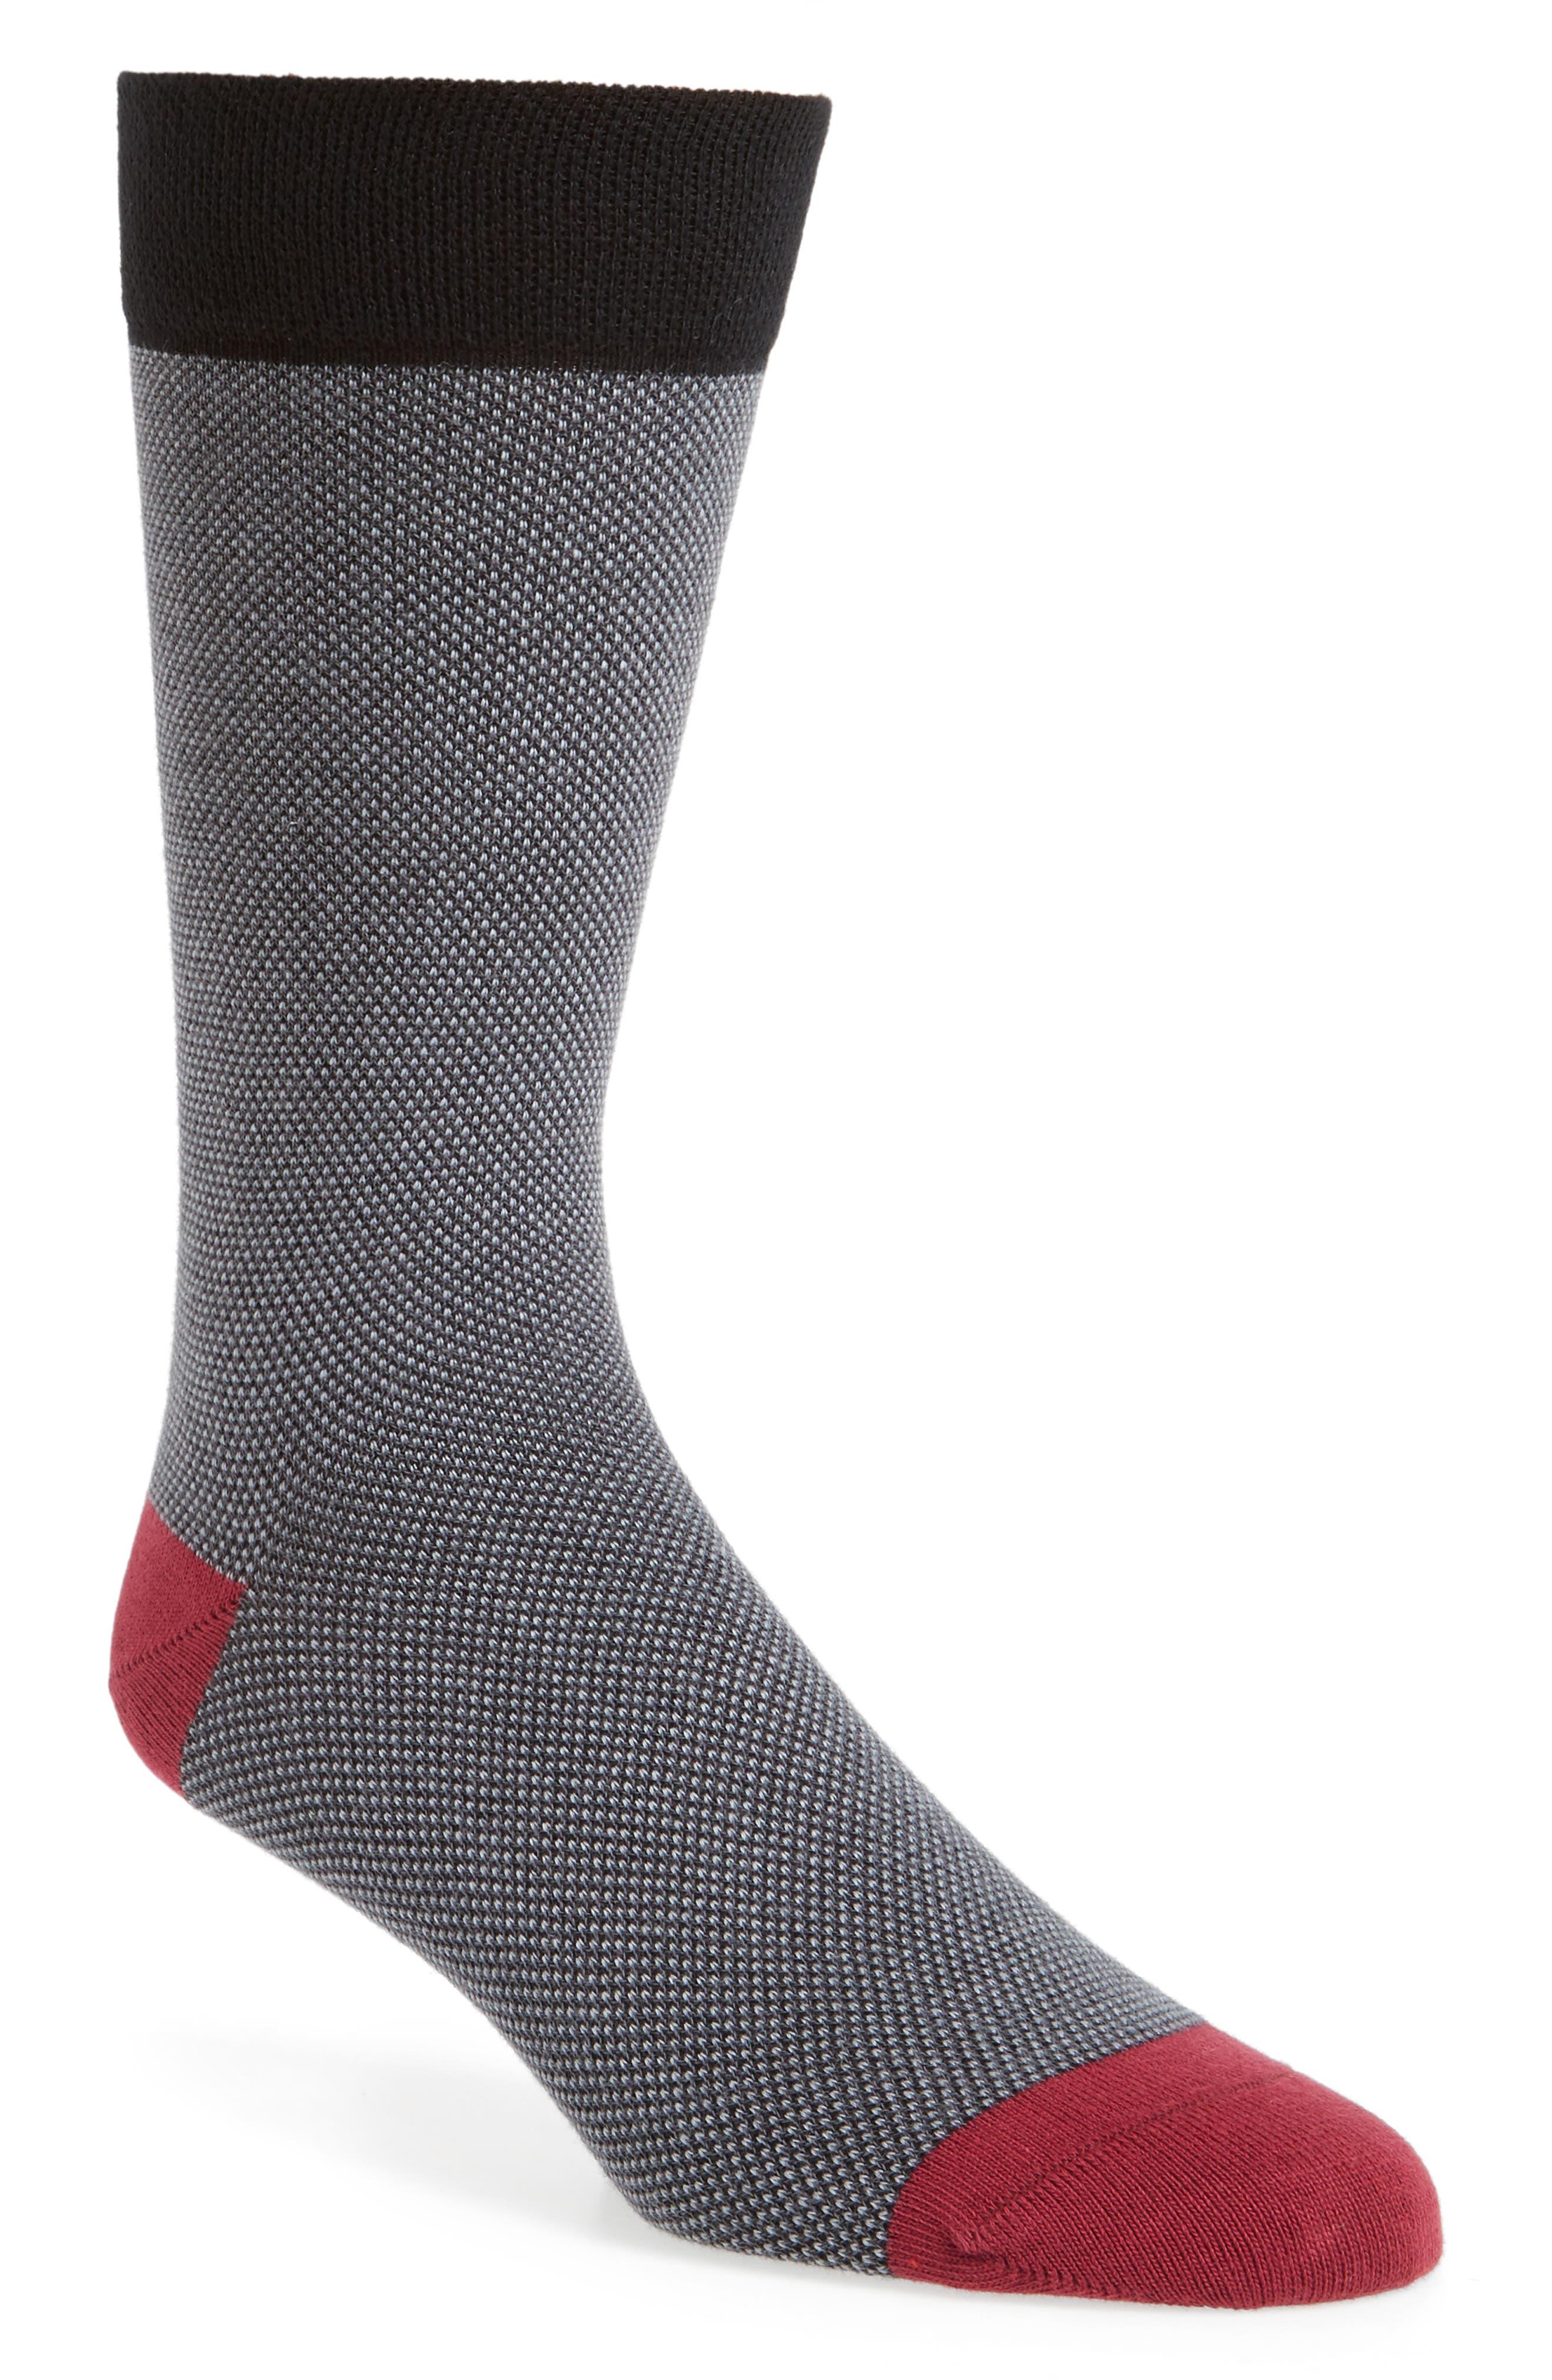 TED BAKER LONDON, Joaquim Solid Socks, Main thumbnail 1, color, BLACK/ CHARCOAL